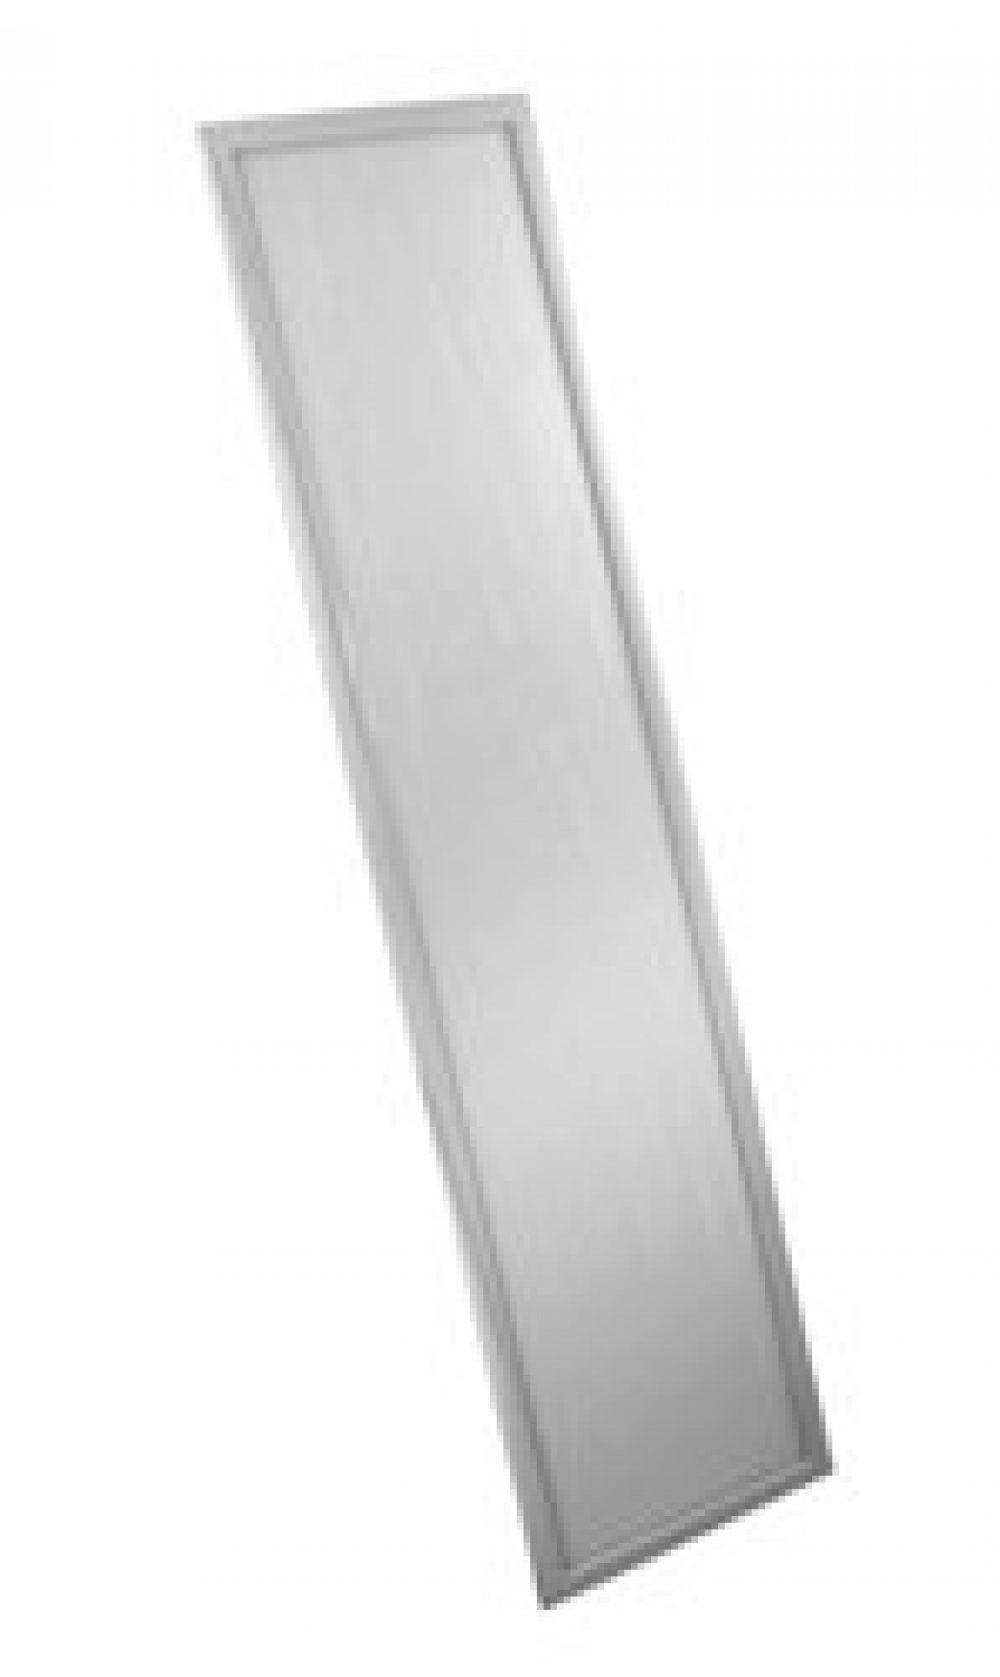 LED Panel Light AU01-PL12030-40W/5K